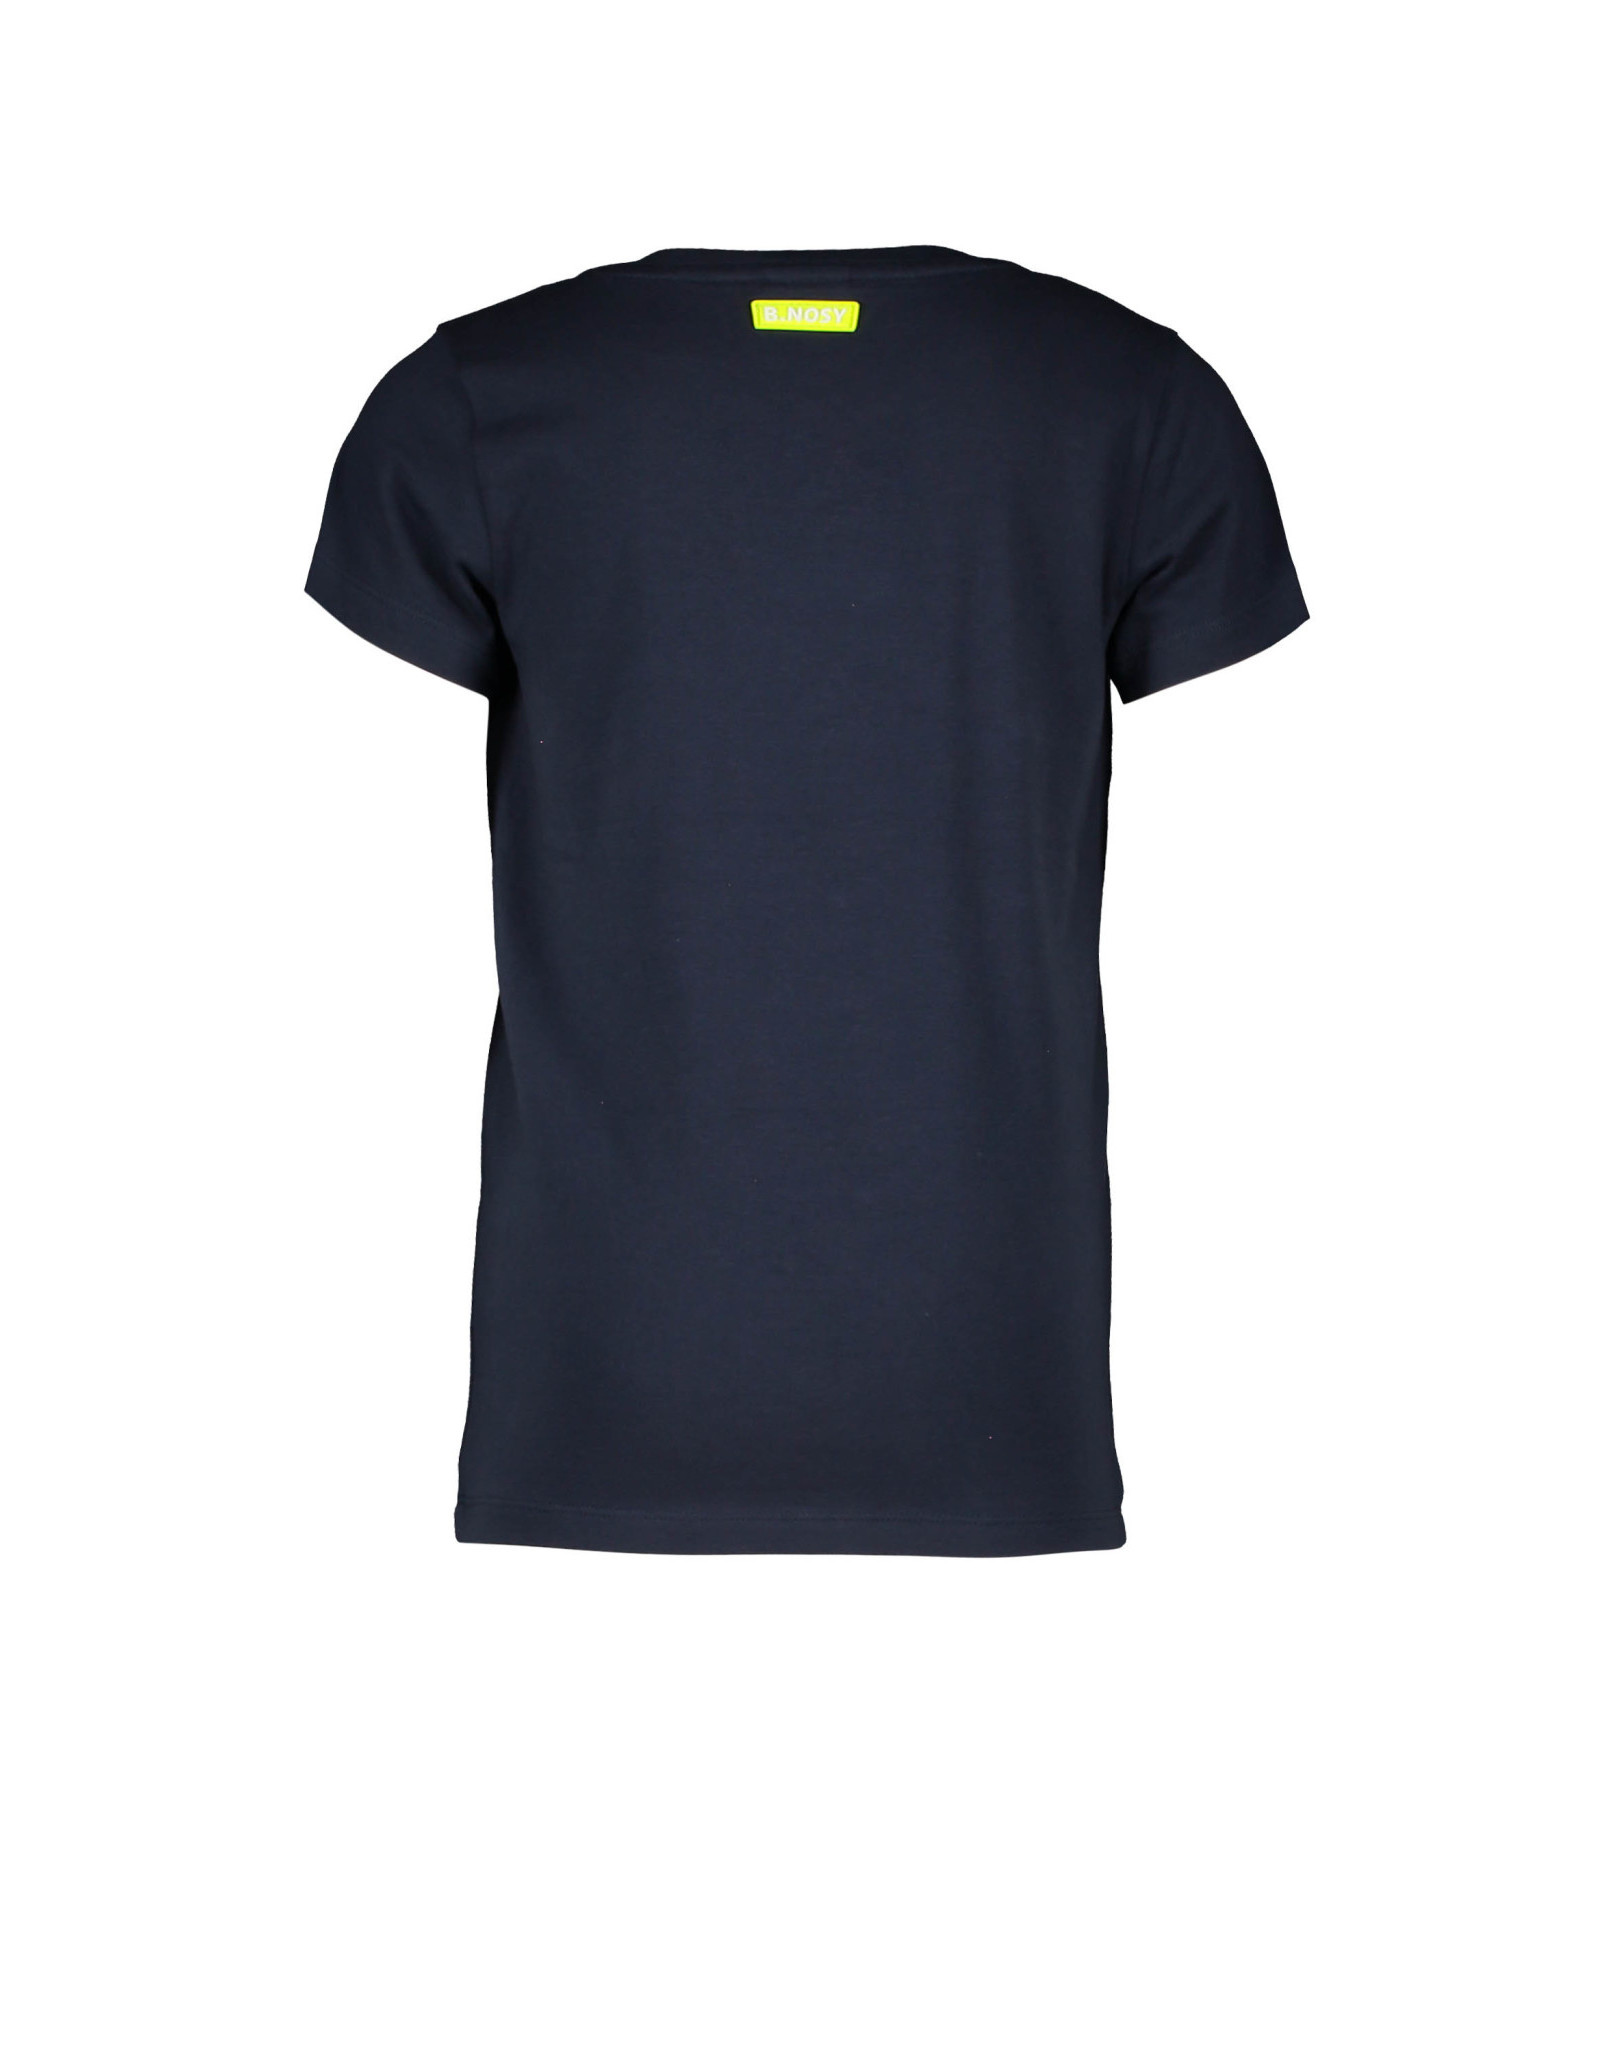 B.Nosy B.Nosy jongens t-shirt High Waves Oxford Blue